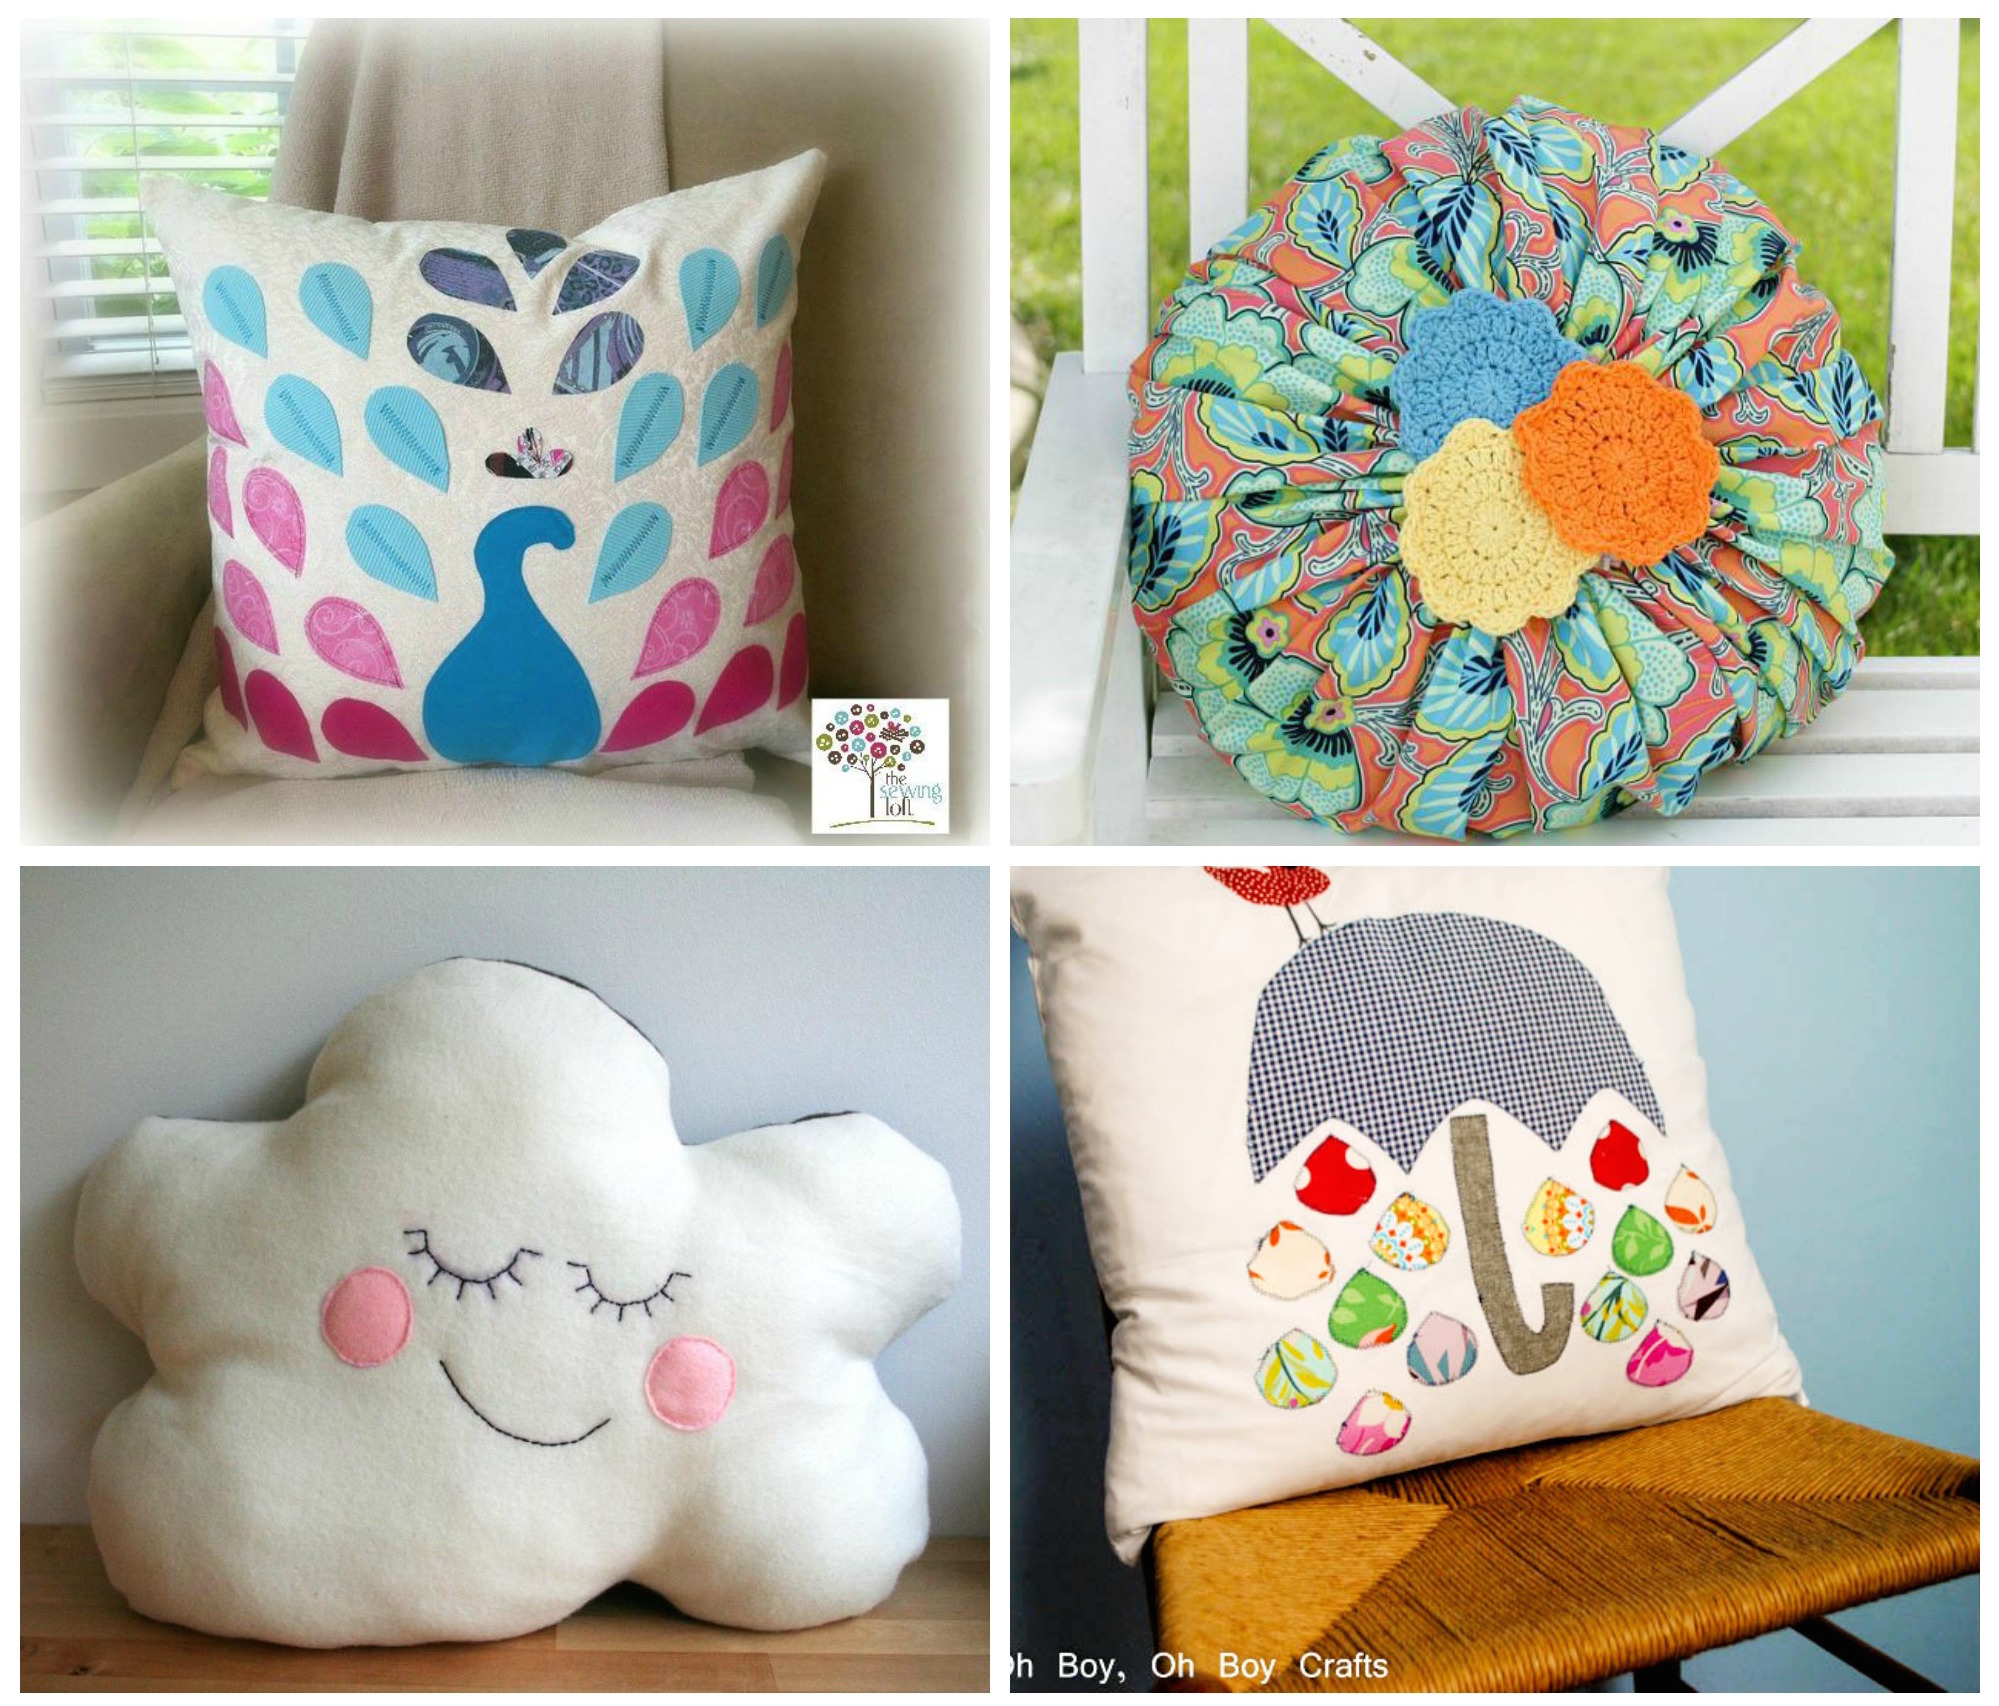 Free-Pillow-Sewing-Patterns